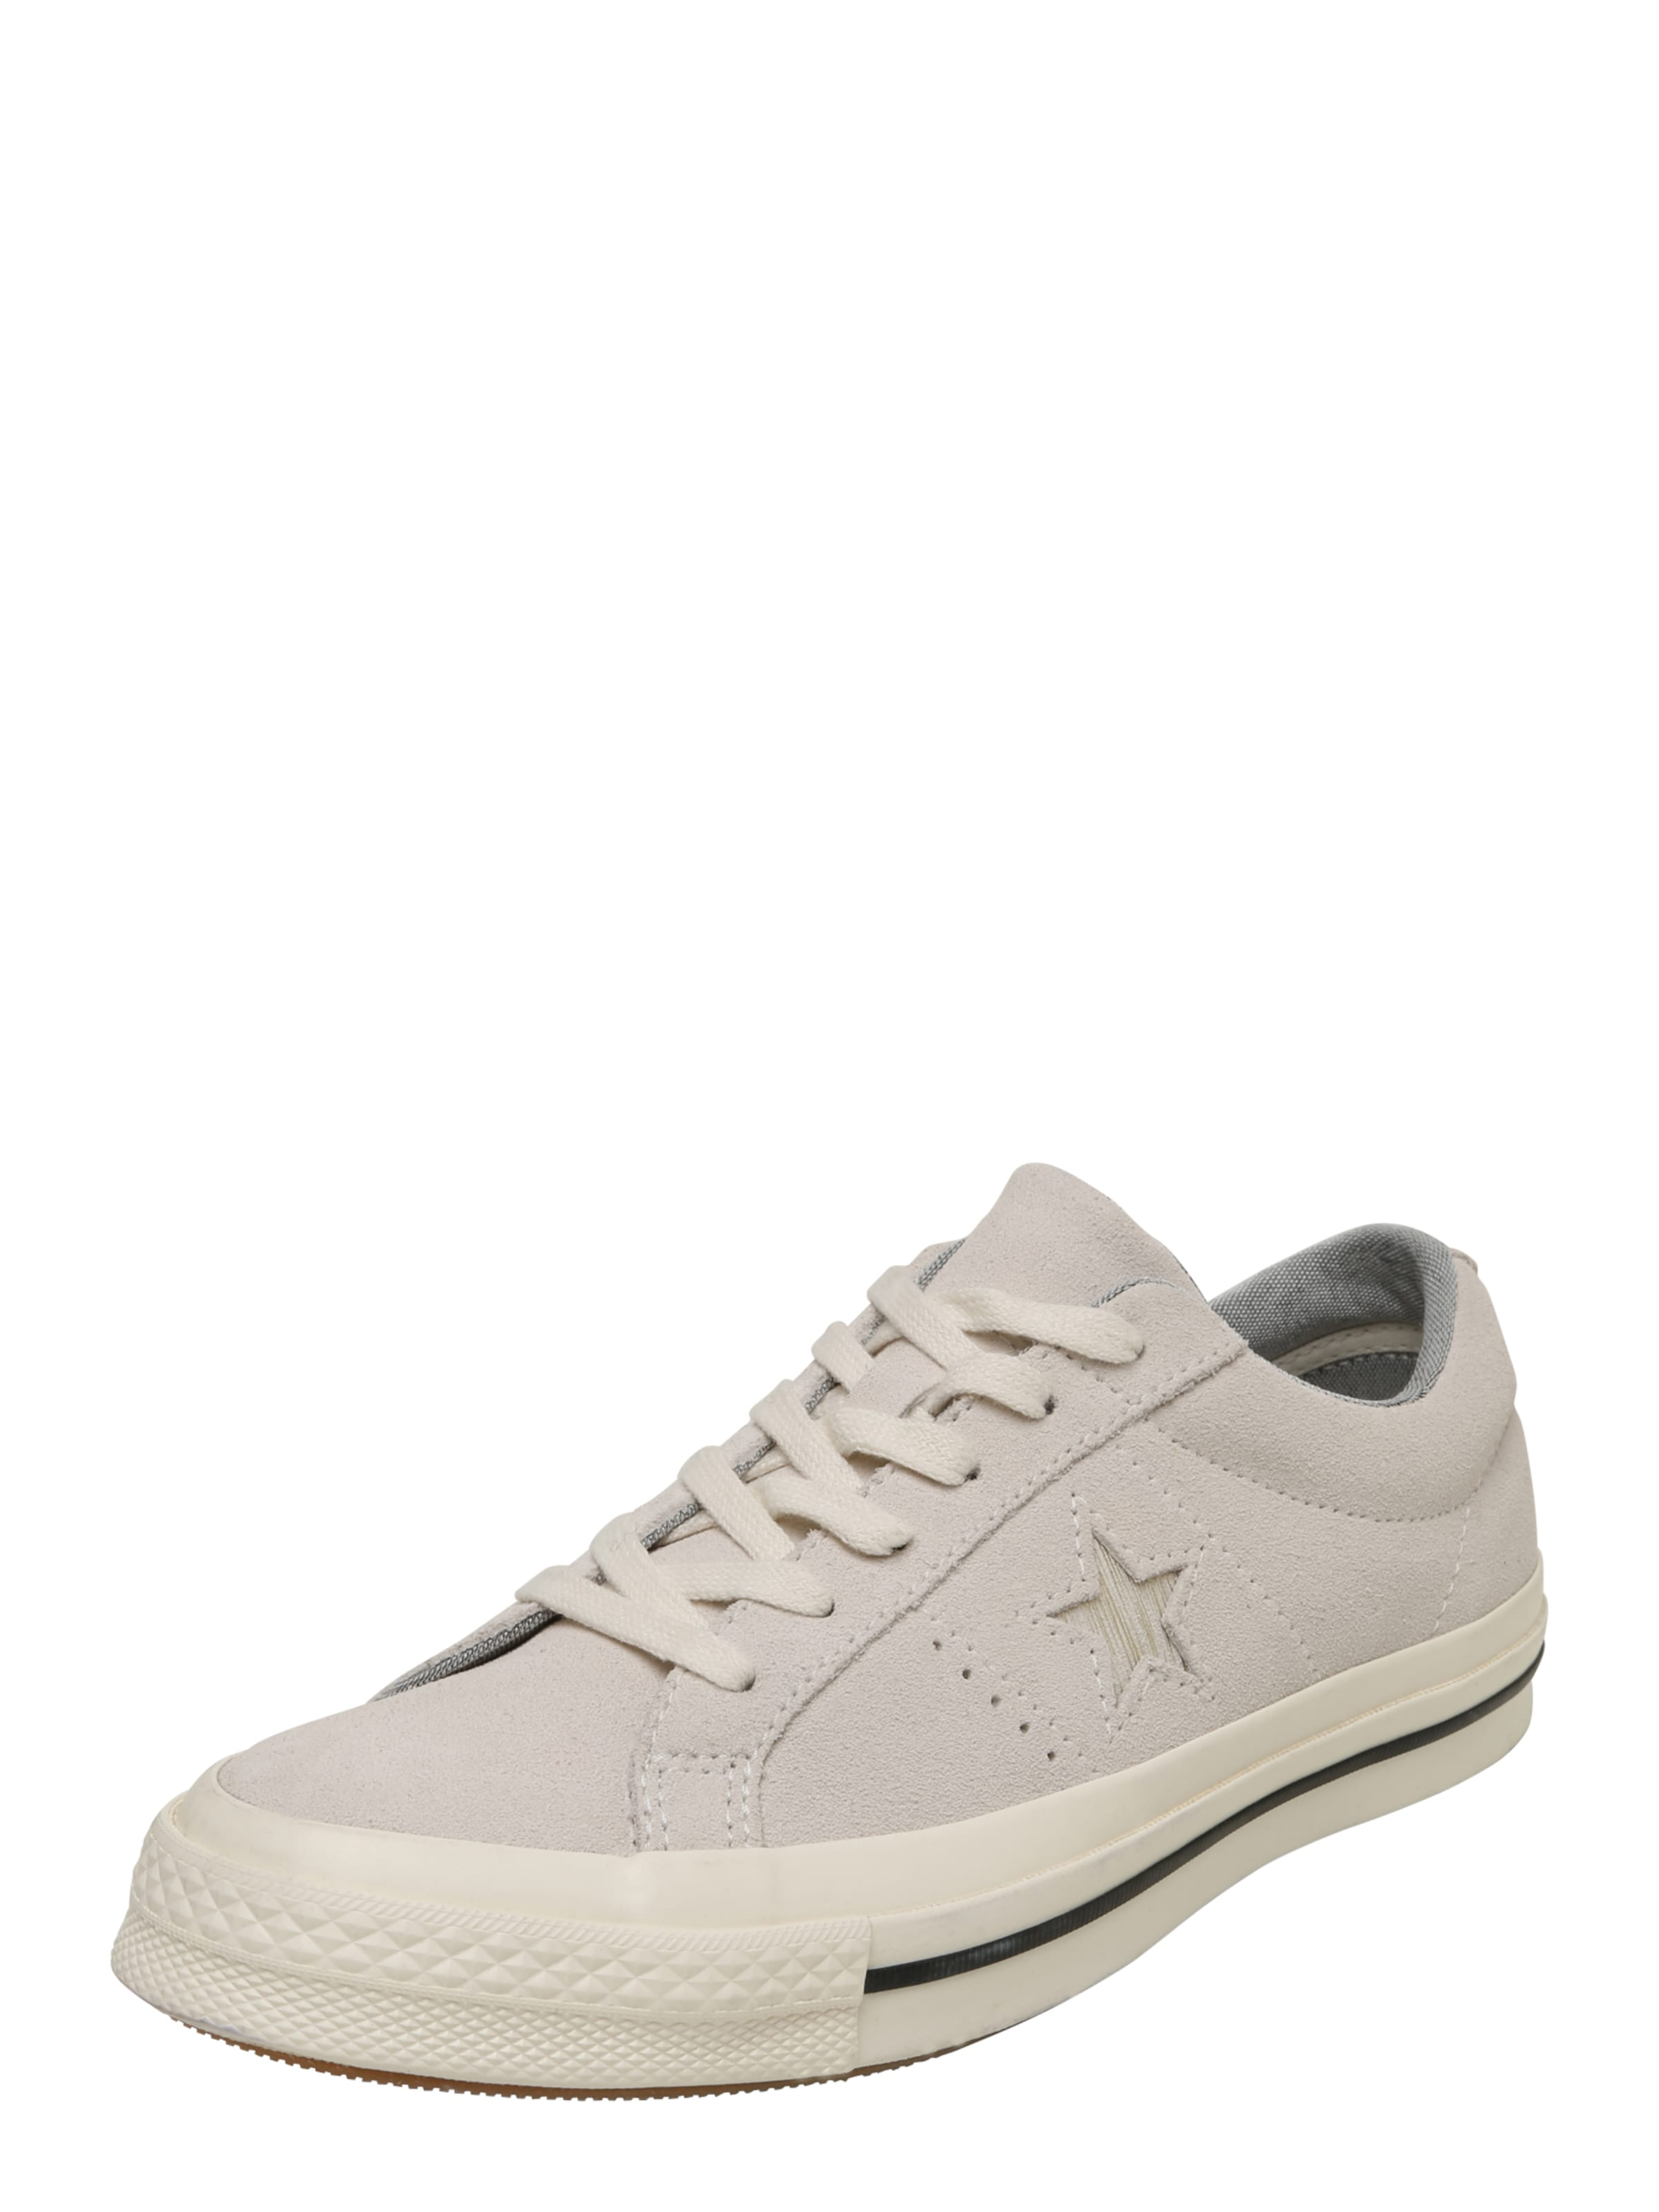 CONVERSE Sneaker  ONE STAR - OX